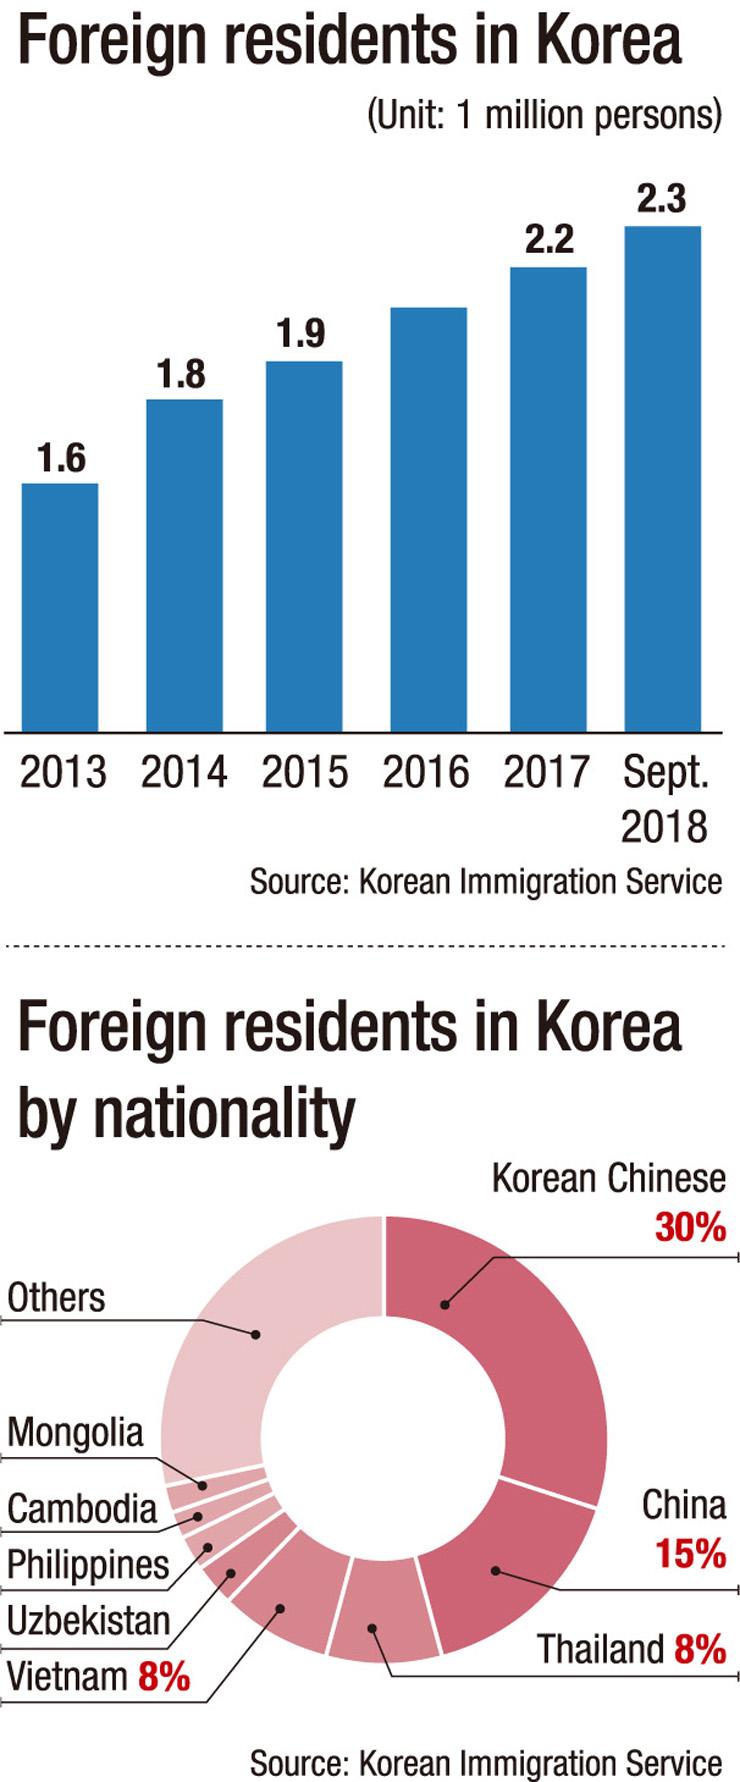 Graphic by Cho Sang-won